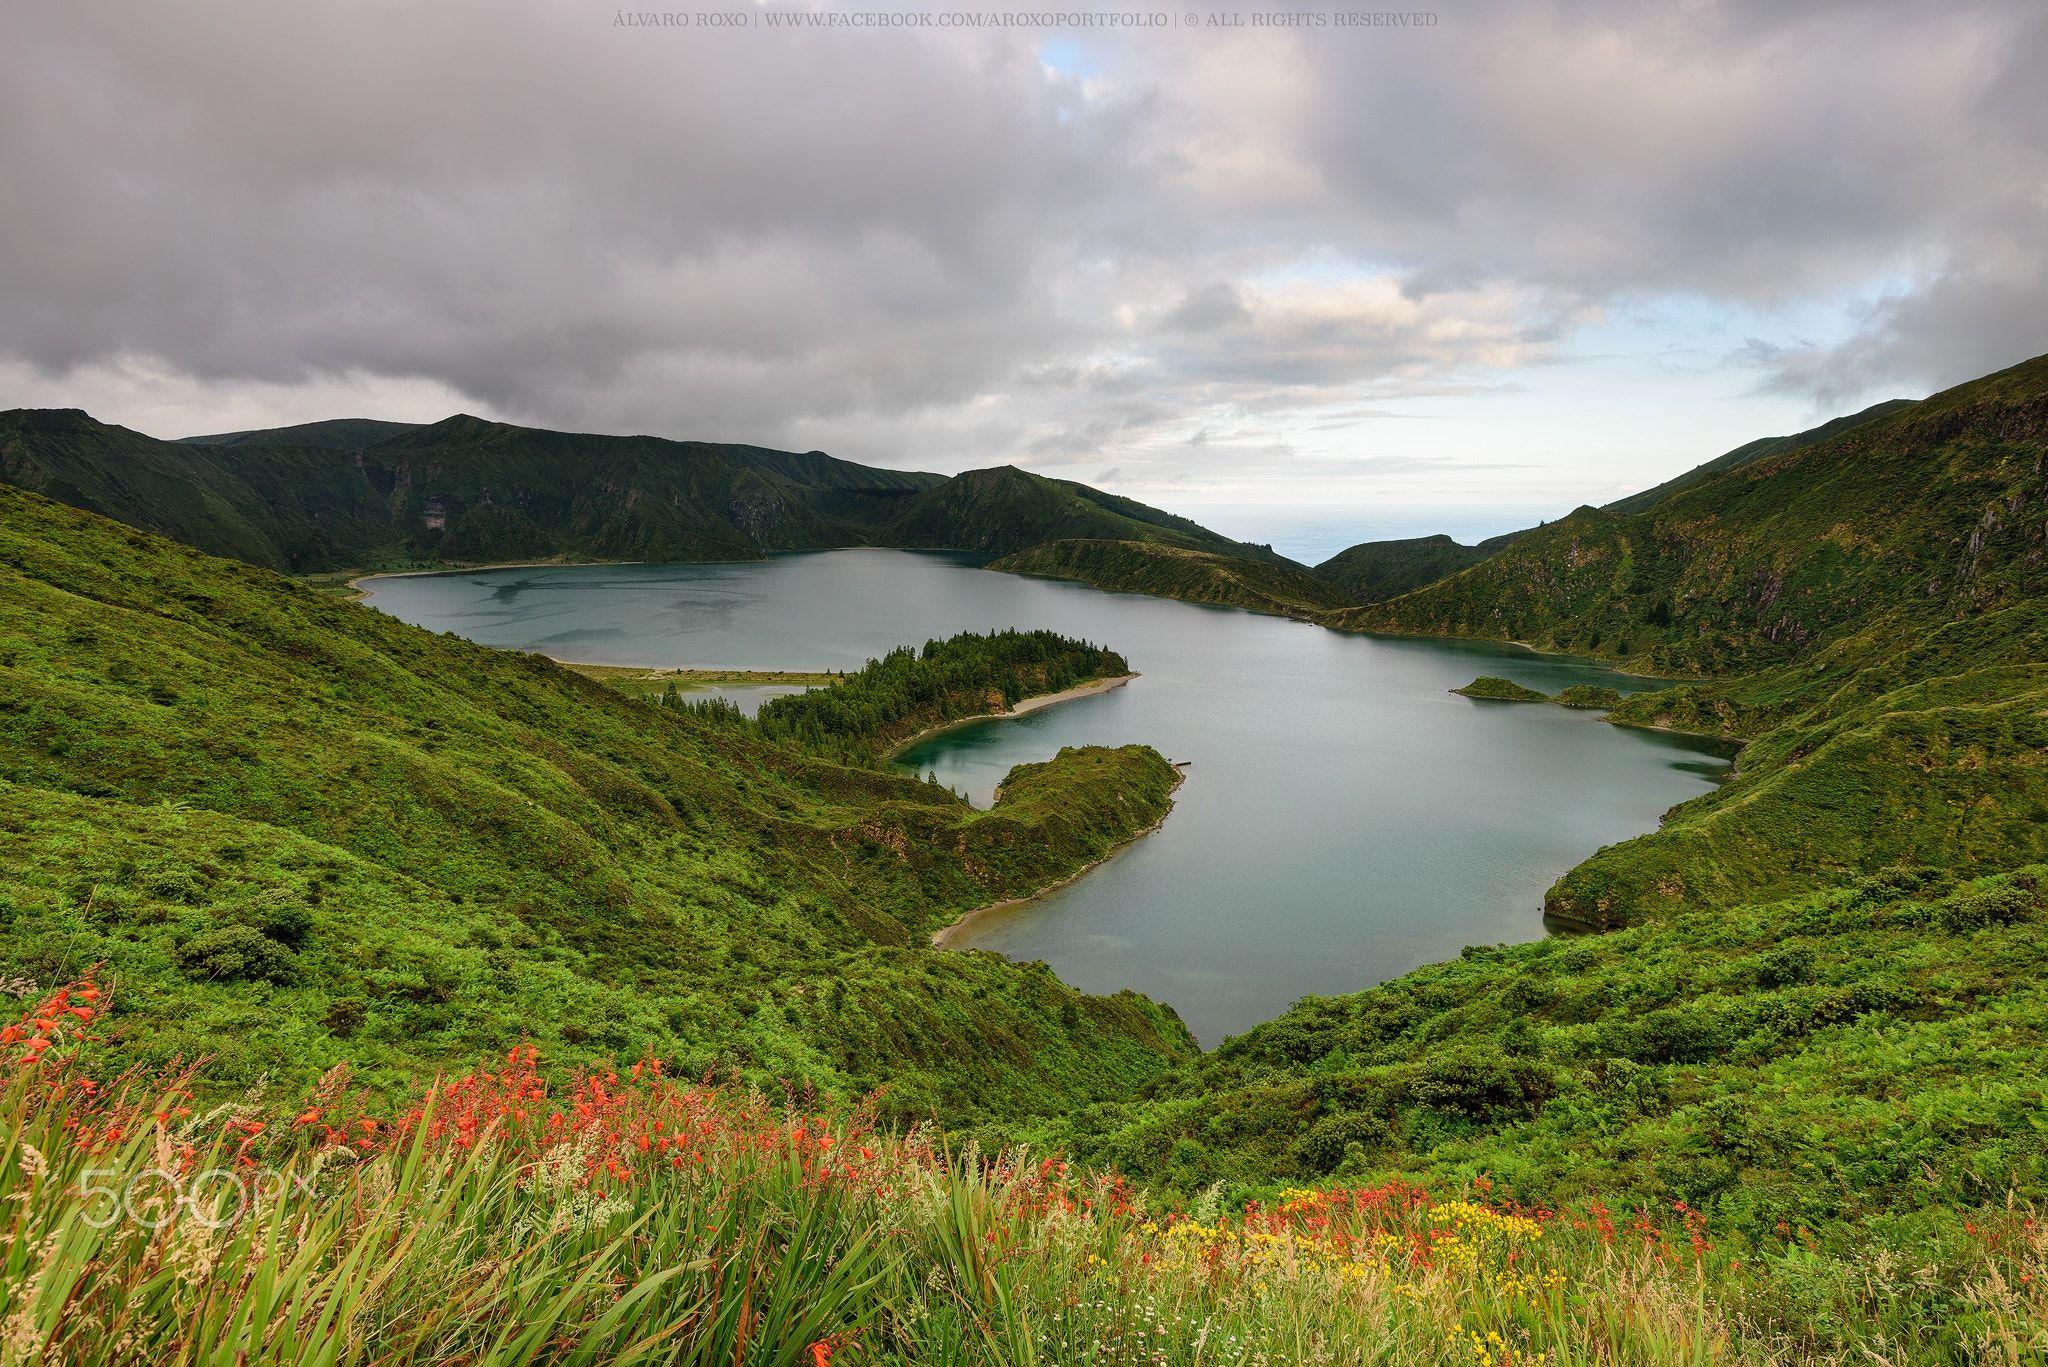 Lagoa do Fogo - Lagoa do Fogo São Miguel Island, Azores - Portugal Nikon D810 + Nikon 16.0-35.0 mm f/4 Lee Little Stopper + Lee ND Grad 0.75 SE  ©Álvaro Roxo   www.facebook.com/ARoxoPortfolio   500px.com/aroxo   https://twitter.com/AlvaroRoxo   https://www.instagram.com/aroxo